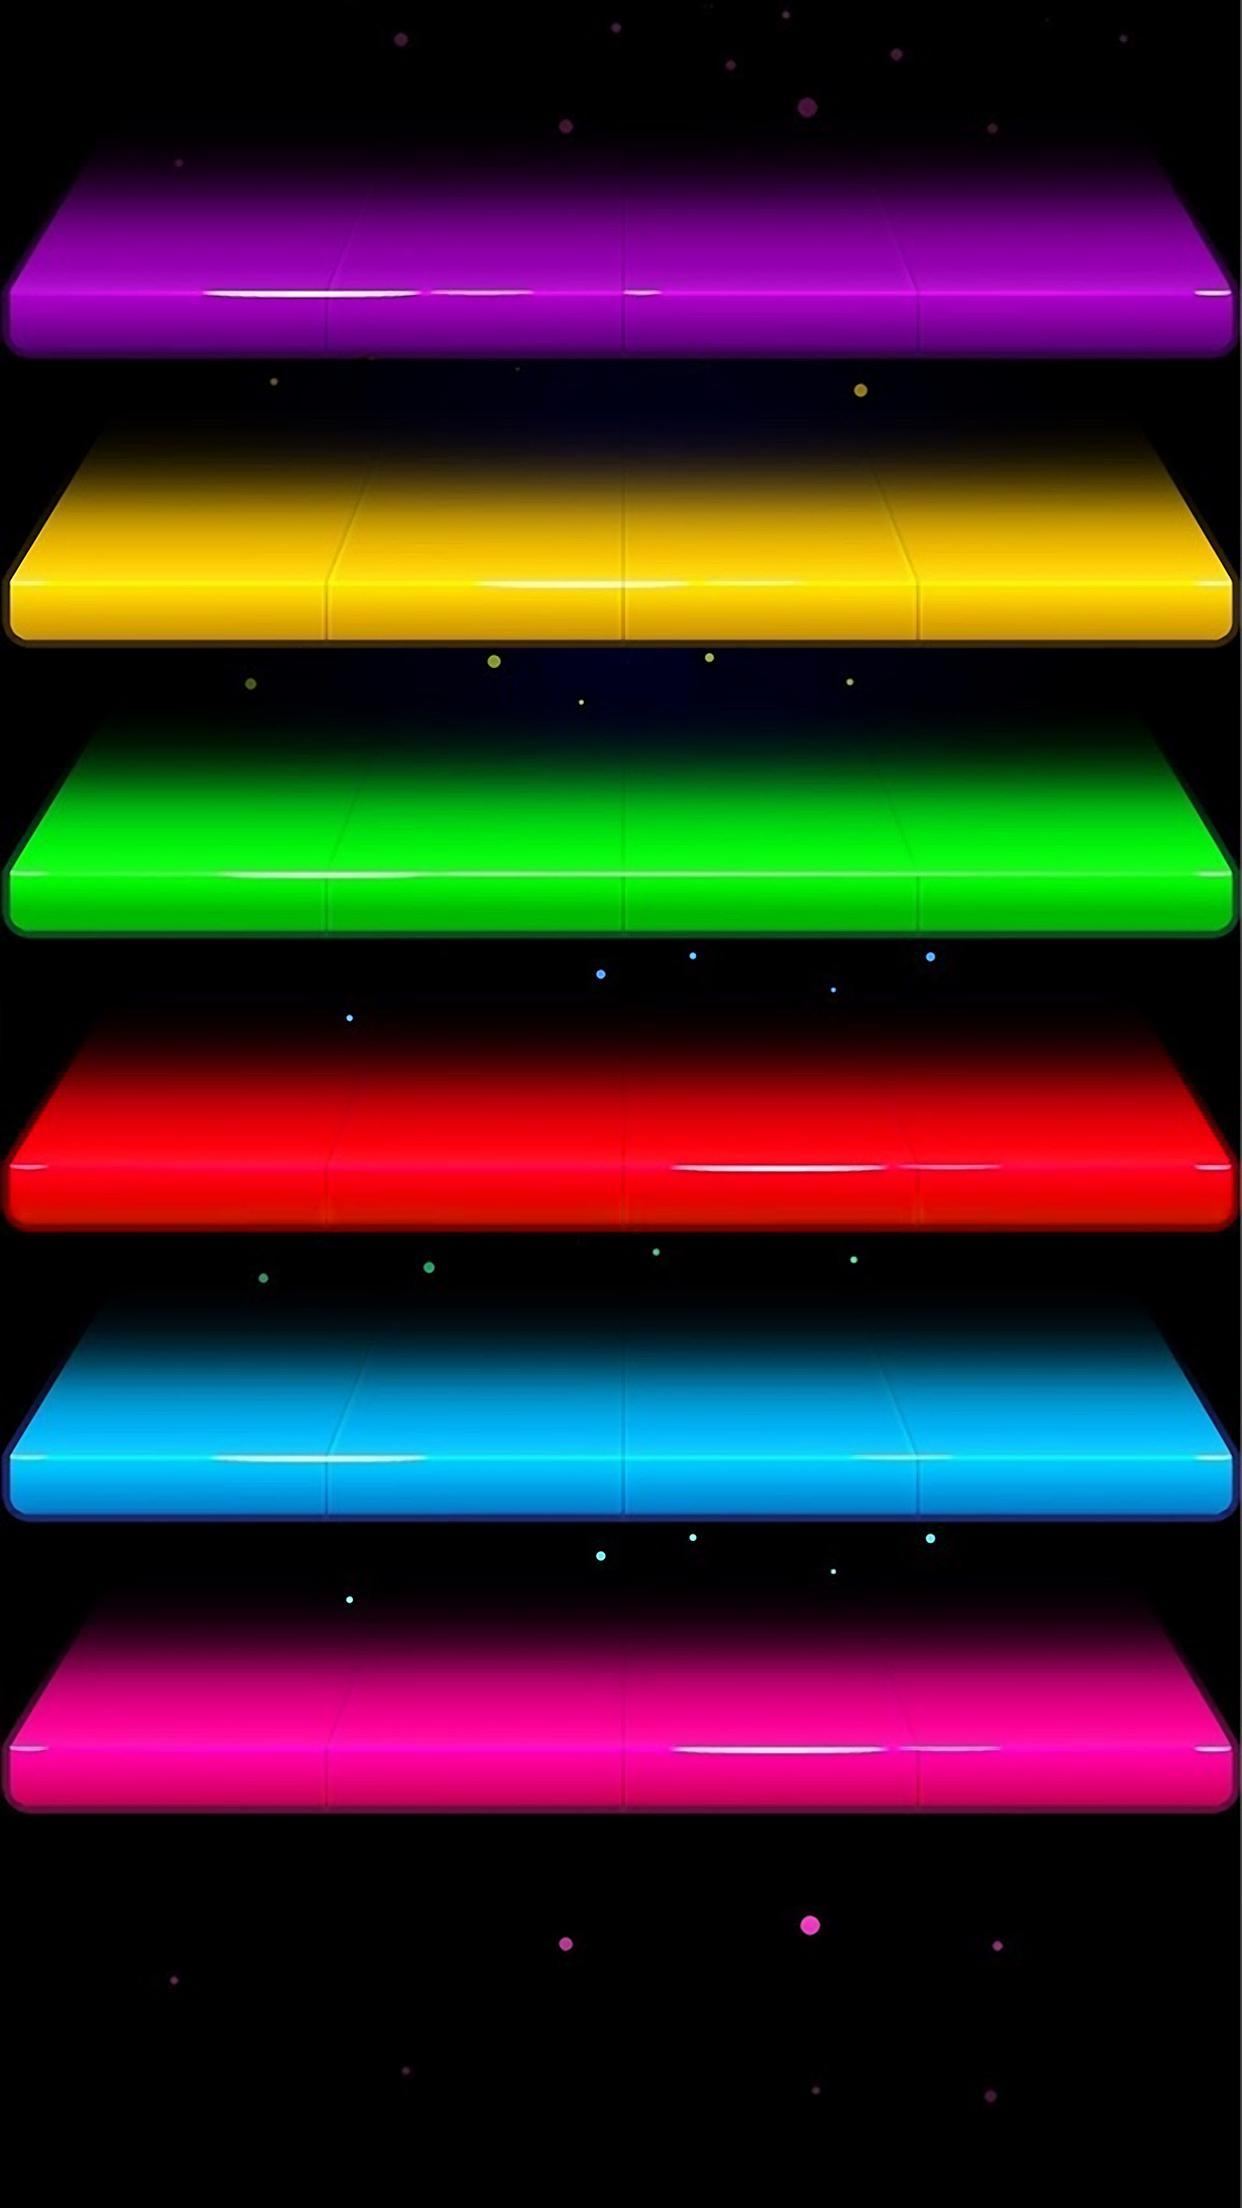 iPhone 7 Plus Wallpaper 1242x2208